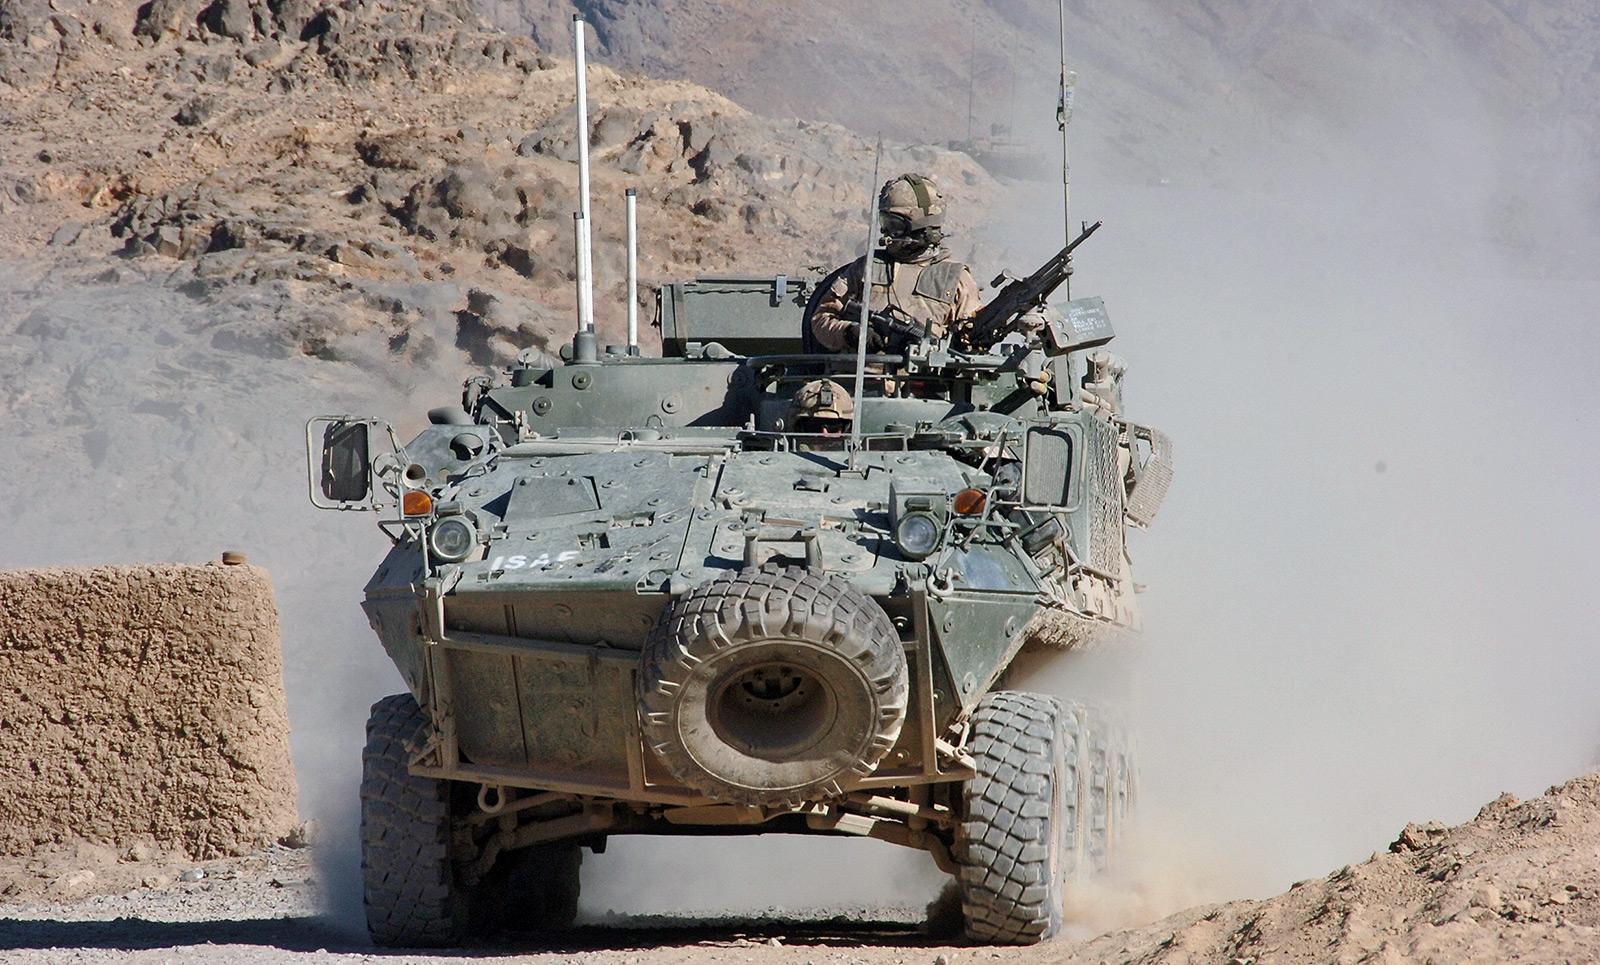 Bison in Afghanistan